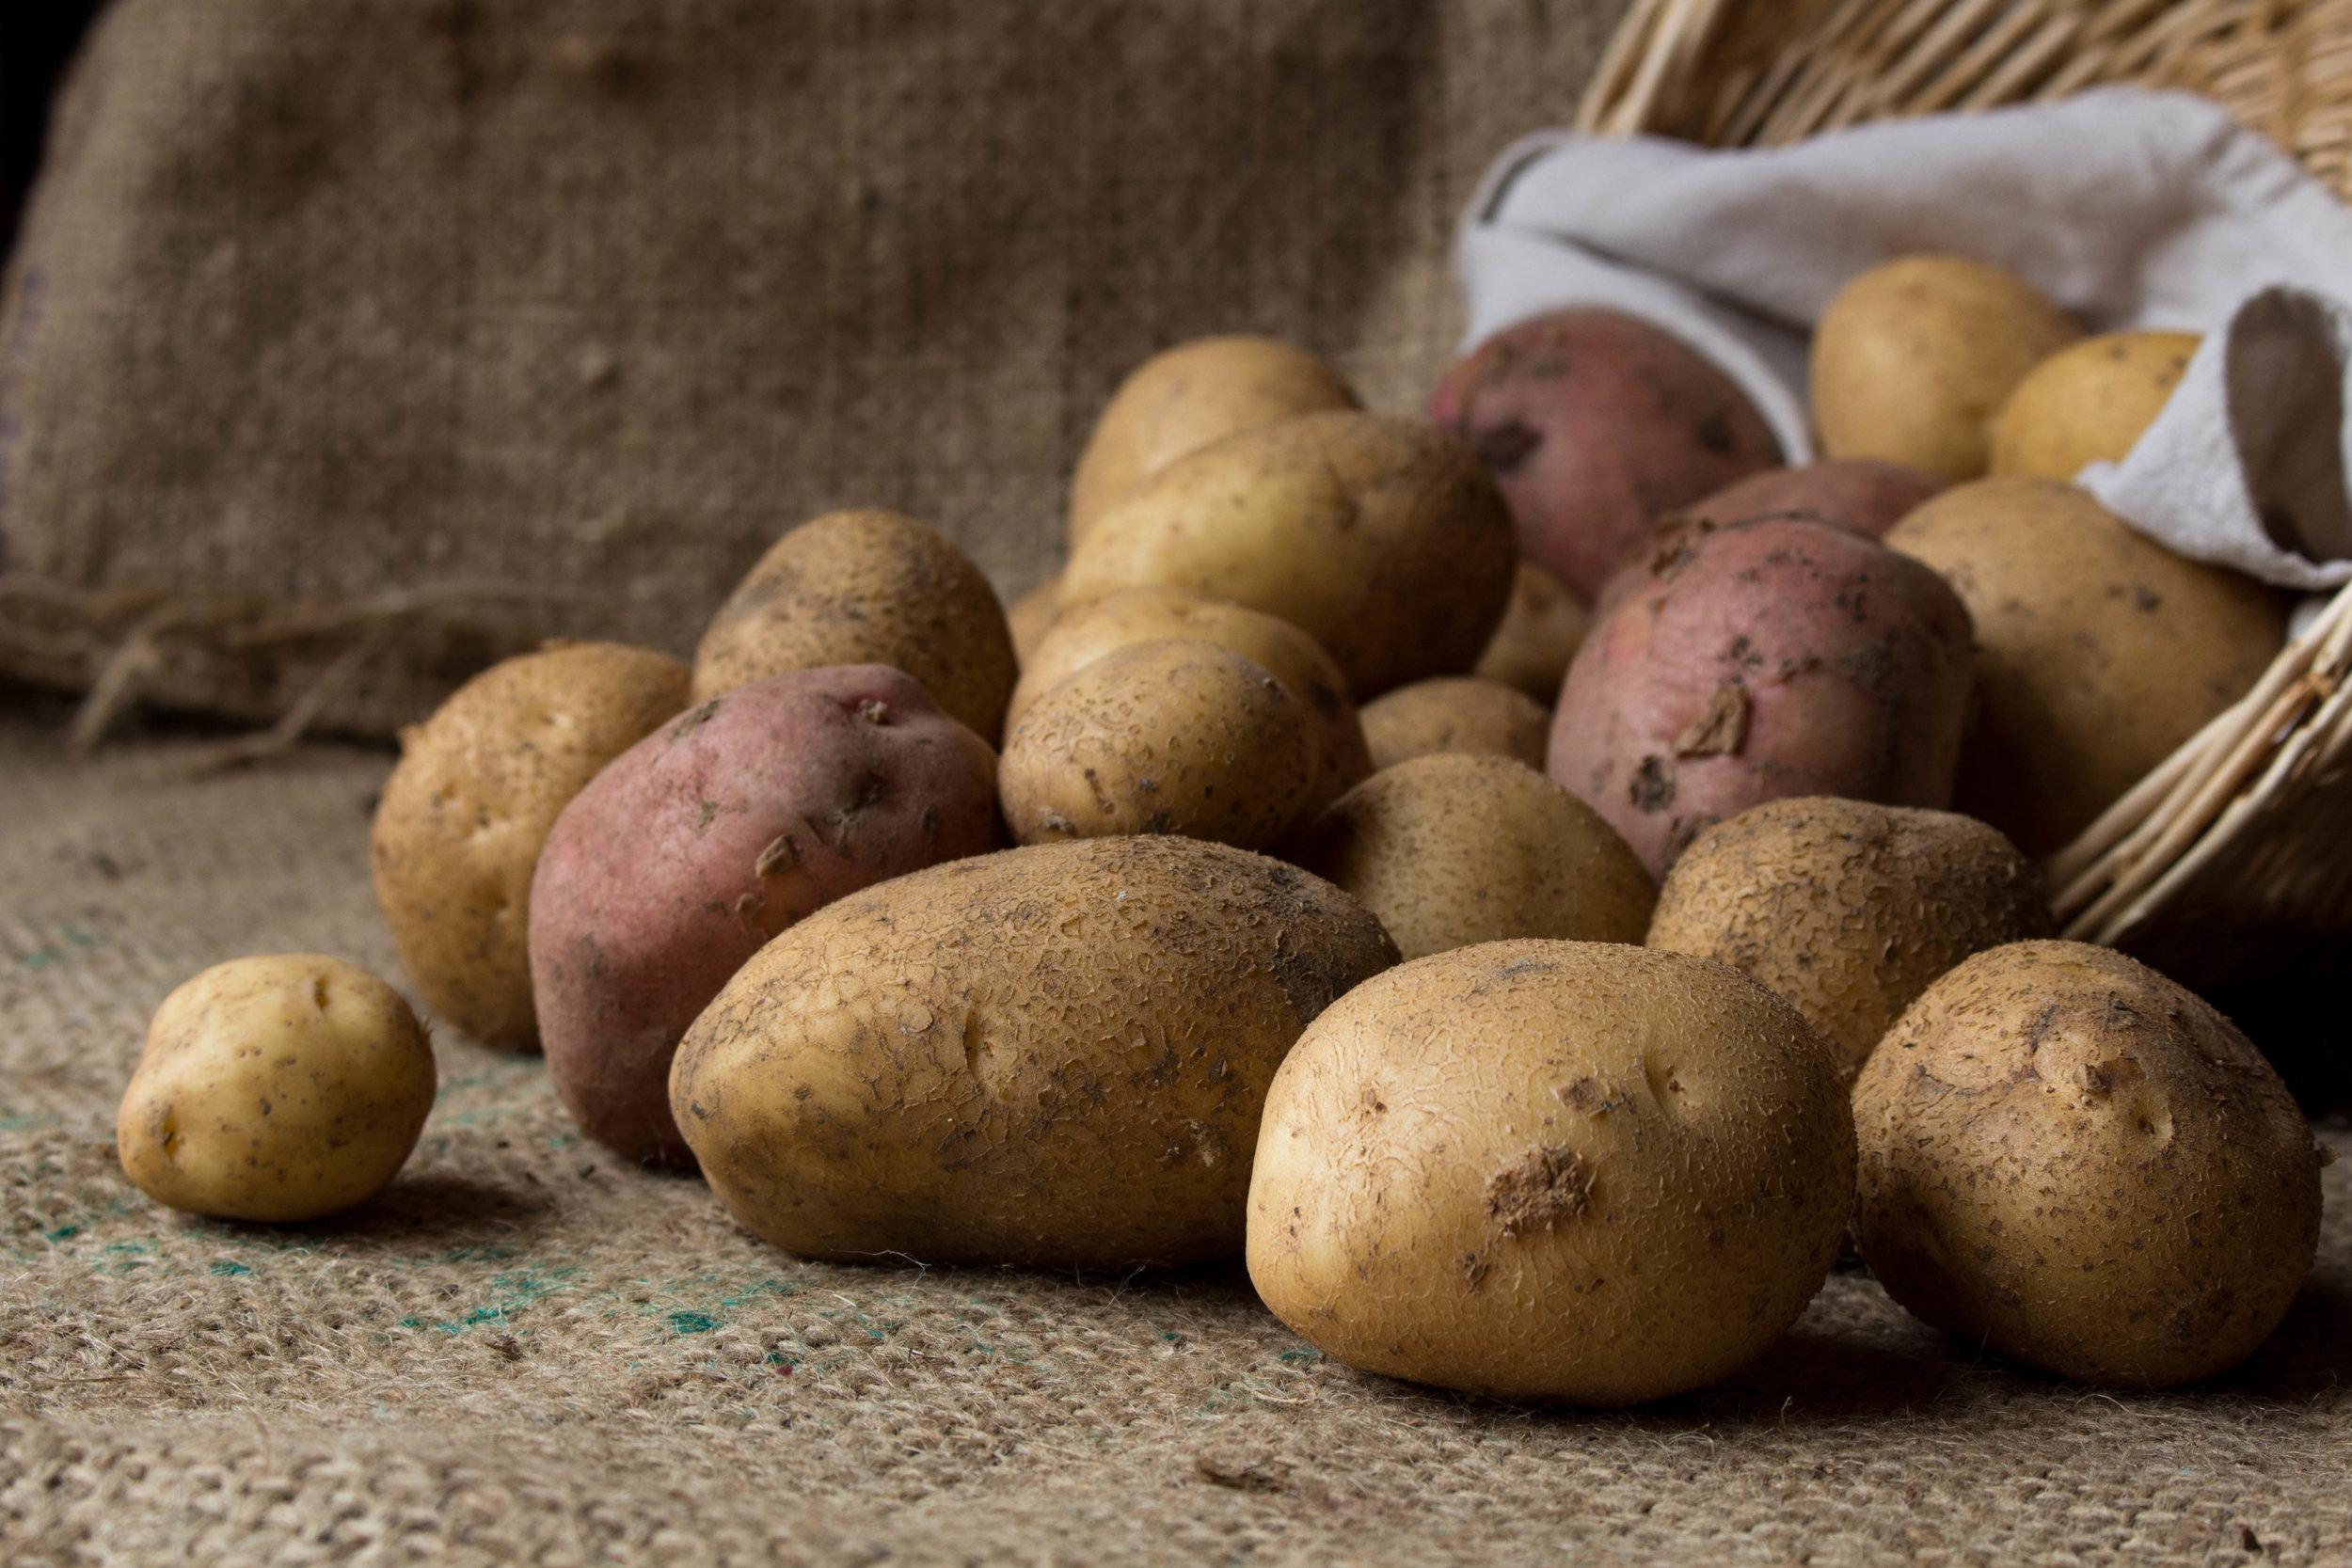 Raw: potatoes